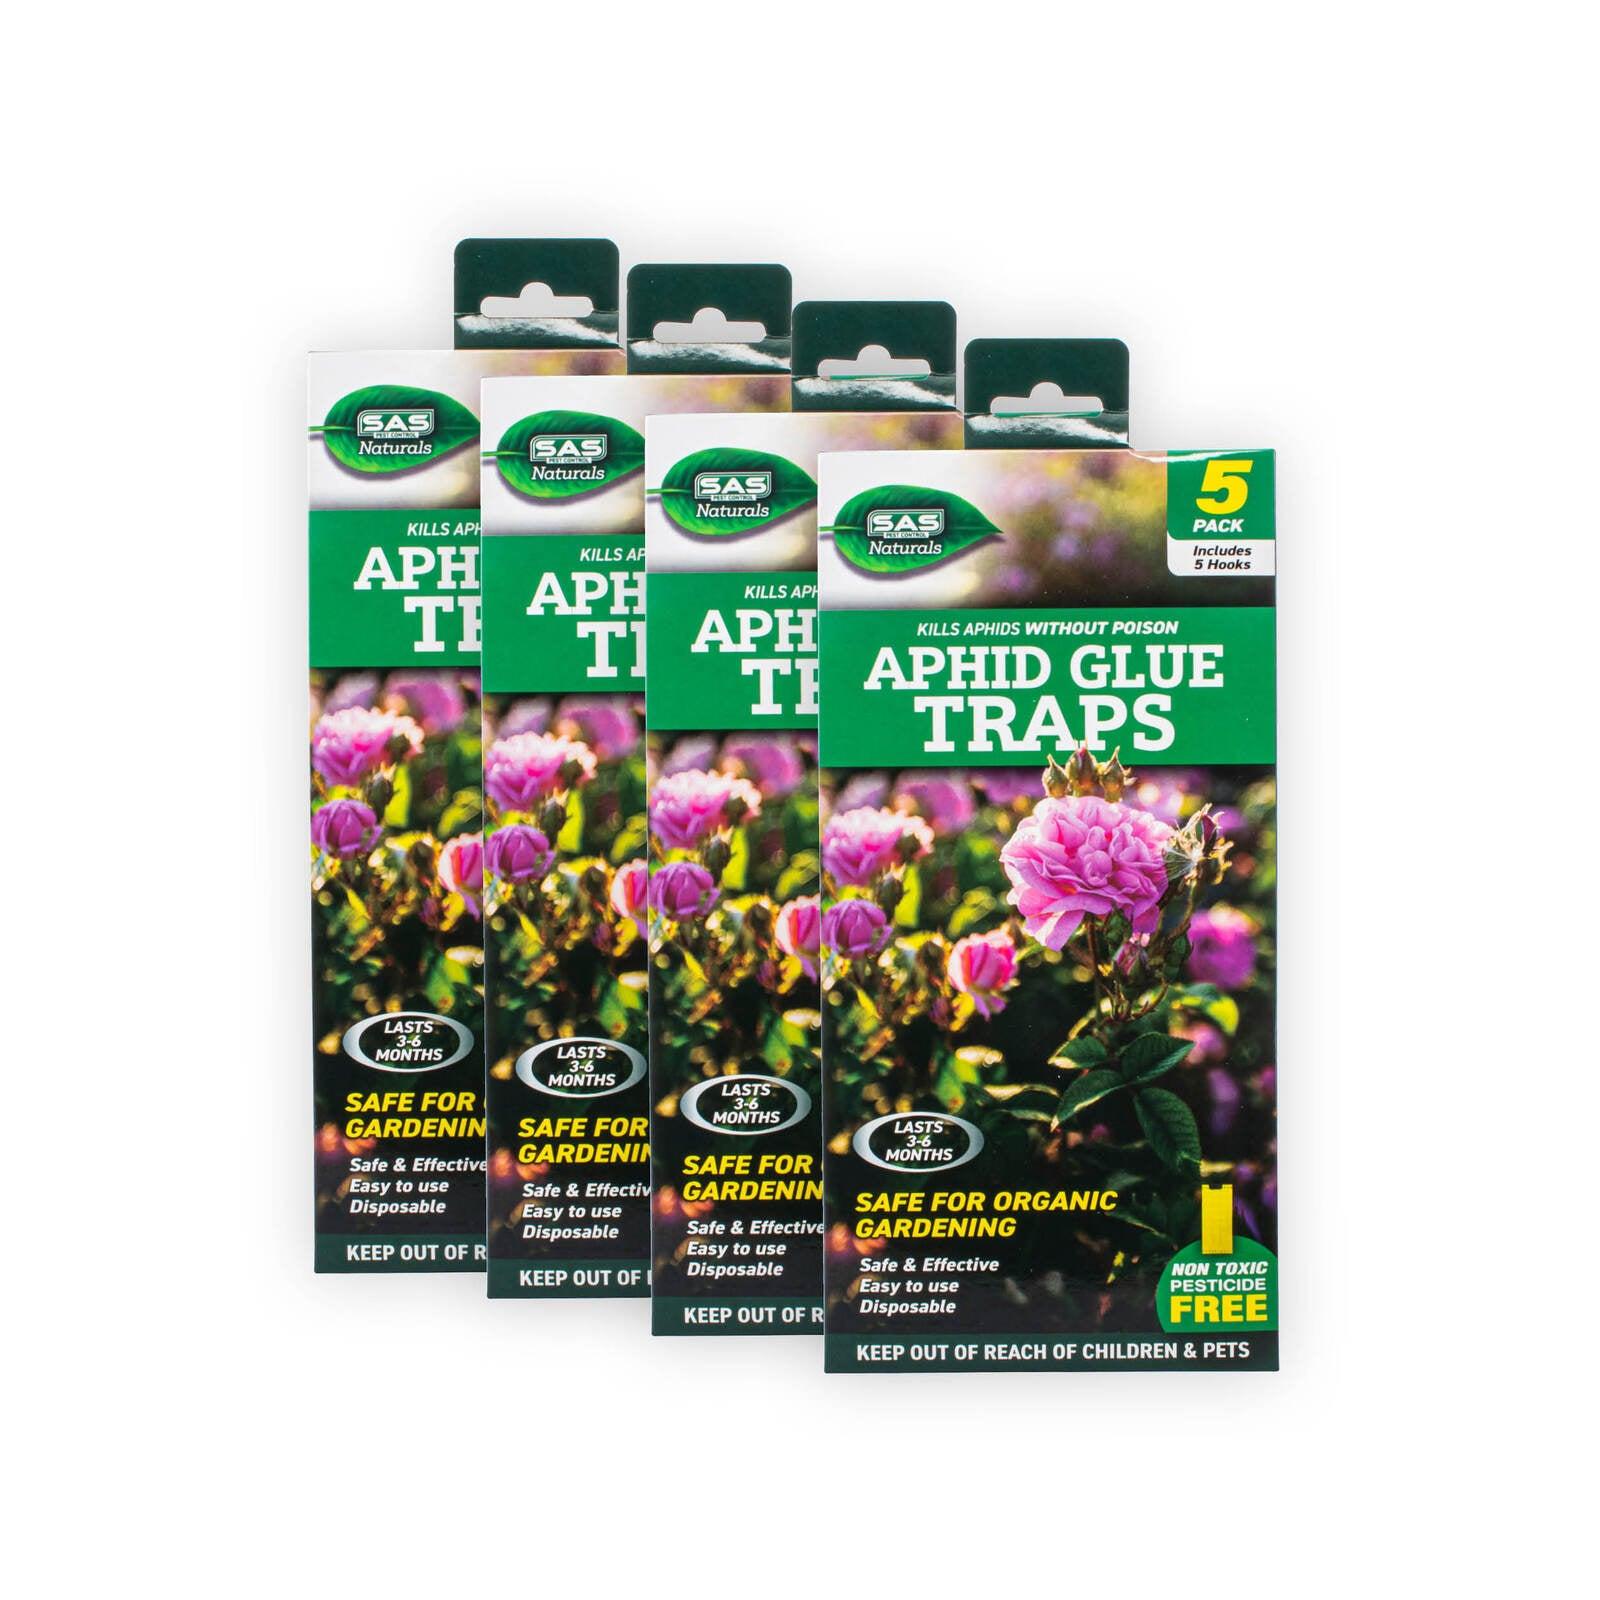 20PCE Traps Aphid Glue Safe Effective Greenhouse Garden White Flies Leaf Miner